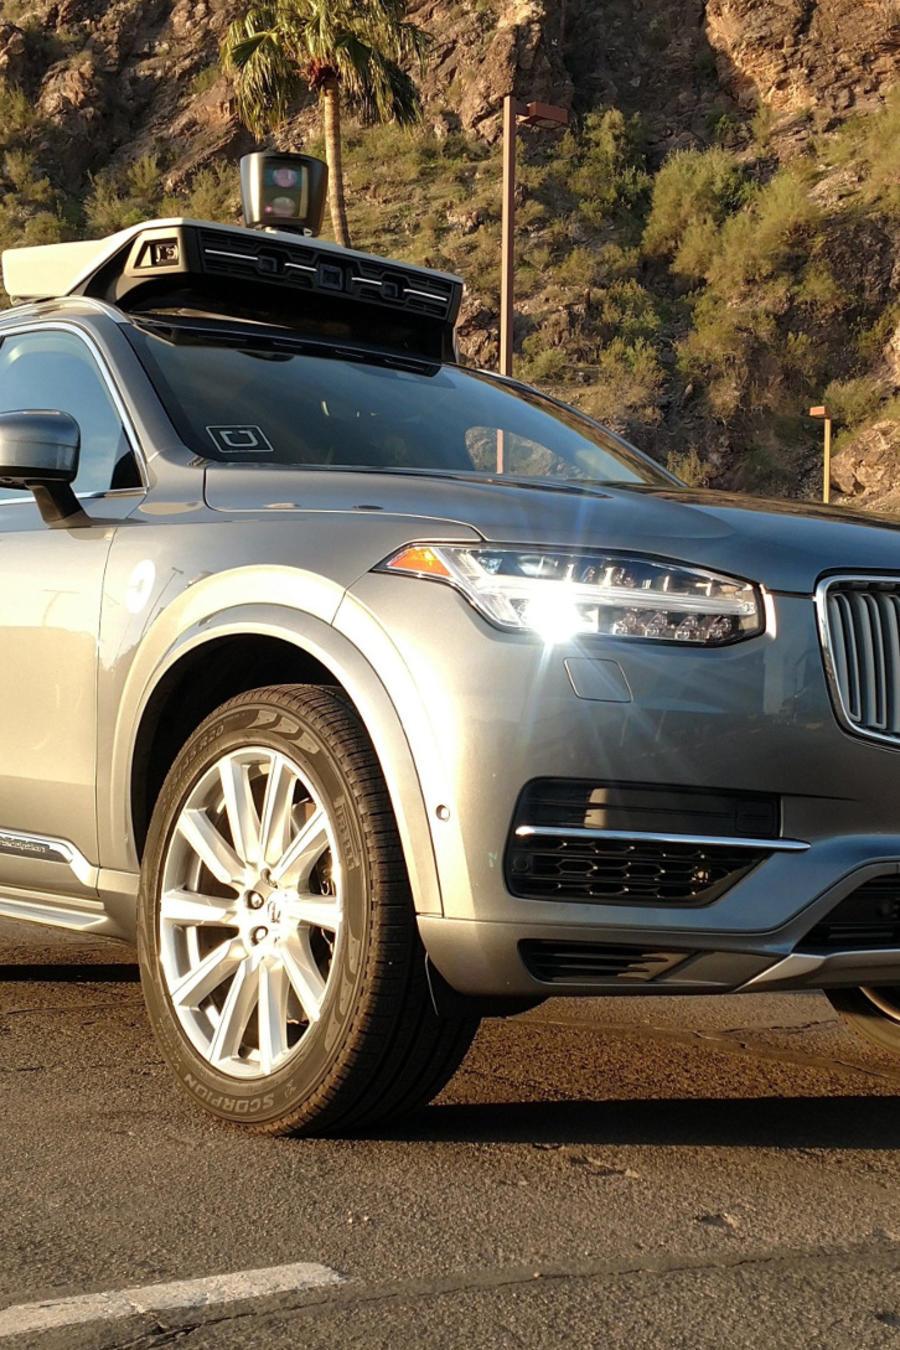 Un vehículo autónomo de Uber mata a un peatón en Arizona (EE.UU.)